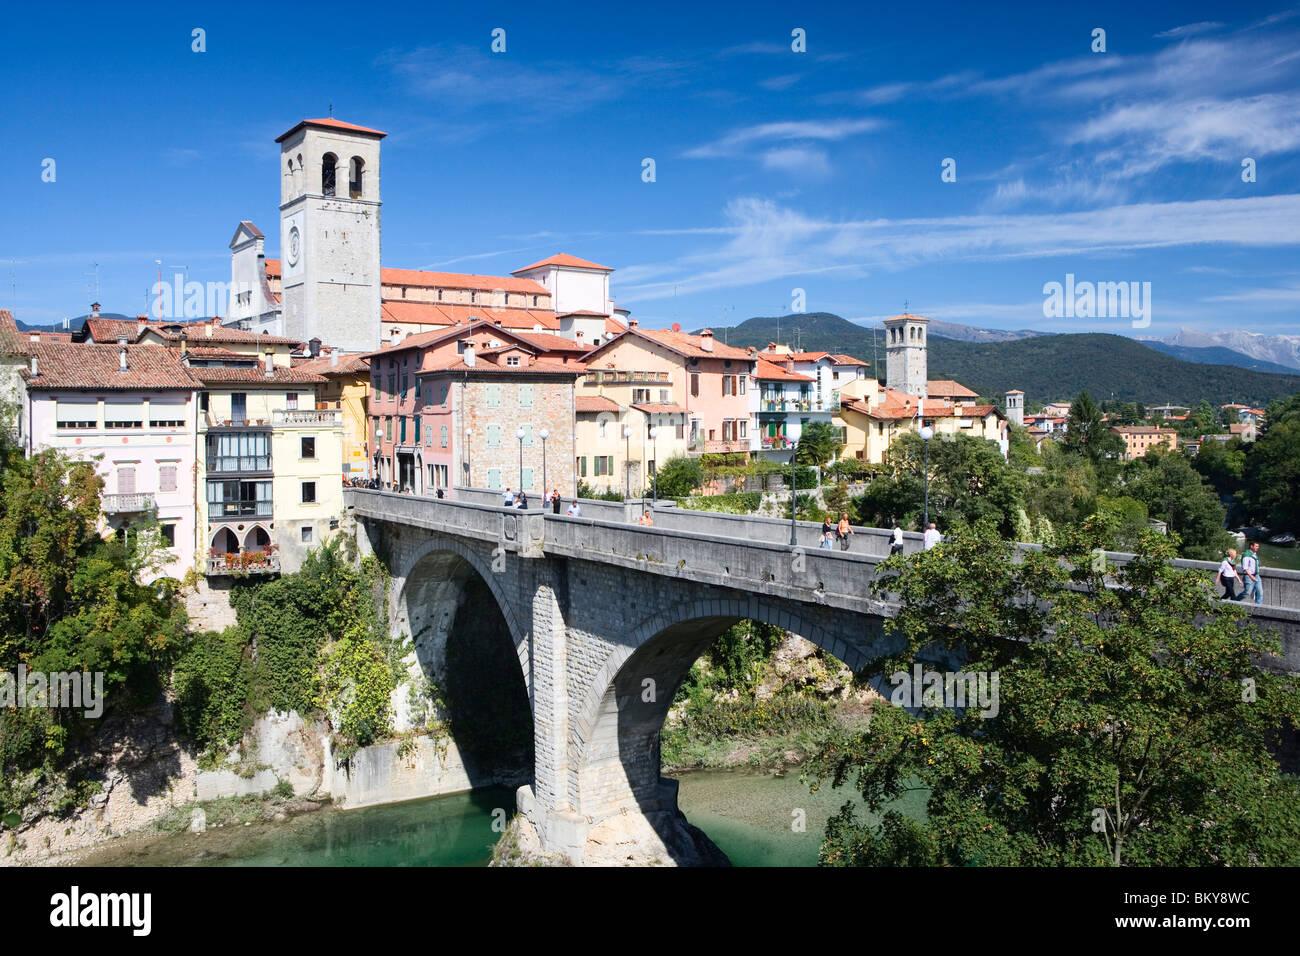 Natisone river with Devil's bridge (15th century, rebuilt in 1918), Cividale del Friuli, Friuli-Venezia Giulia, - Stock Image